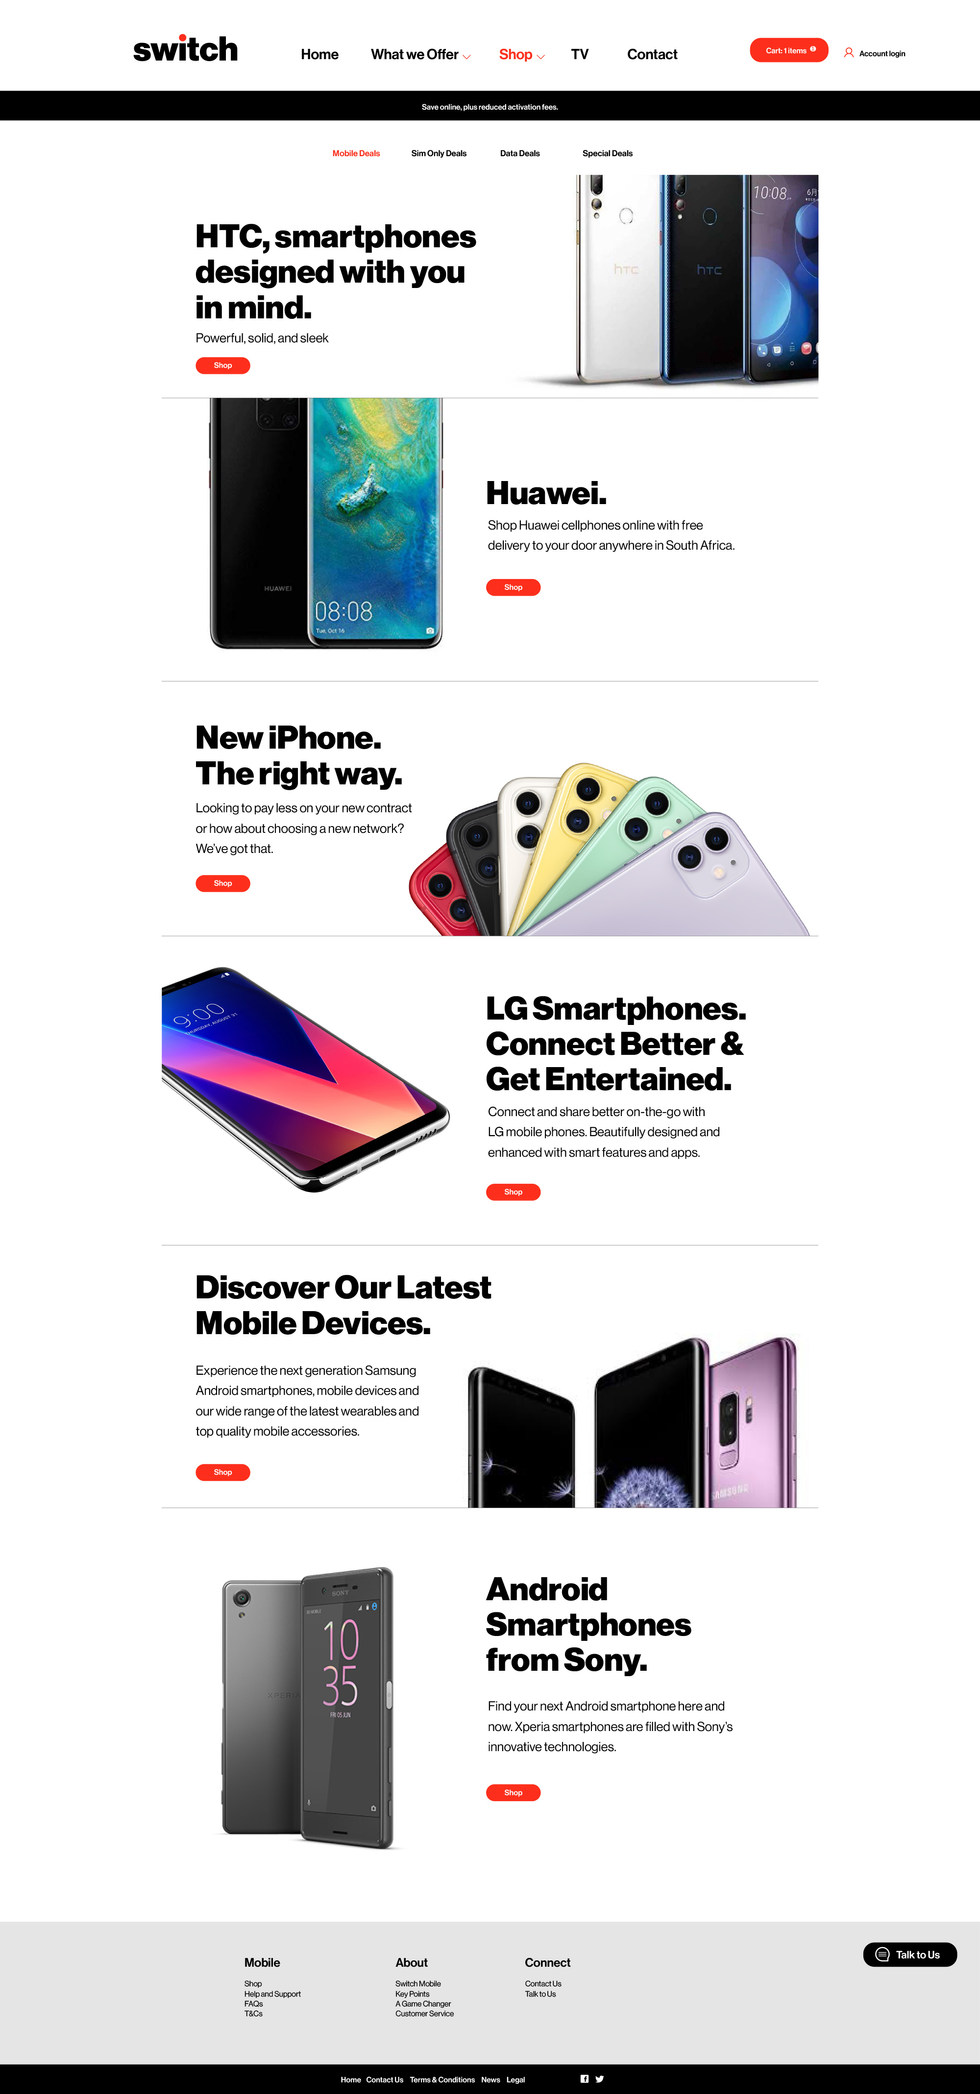 Switch-Mobile-Website-UI-UX20-2.jpg